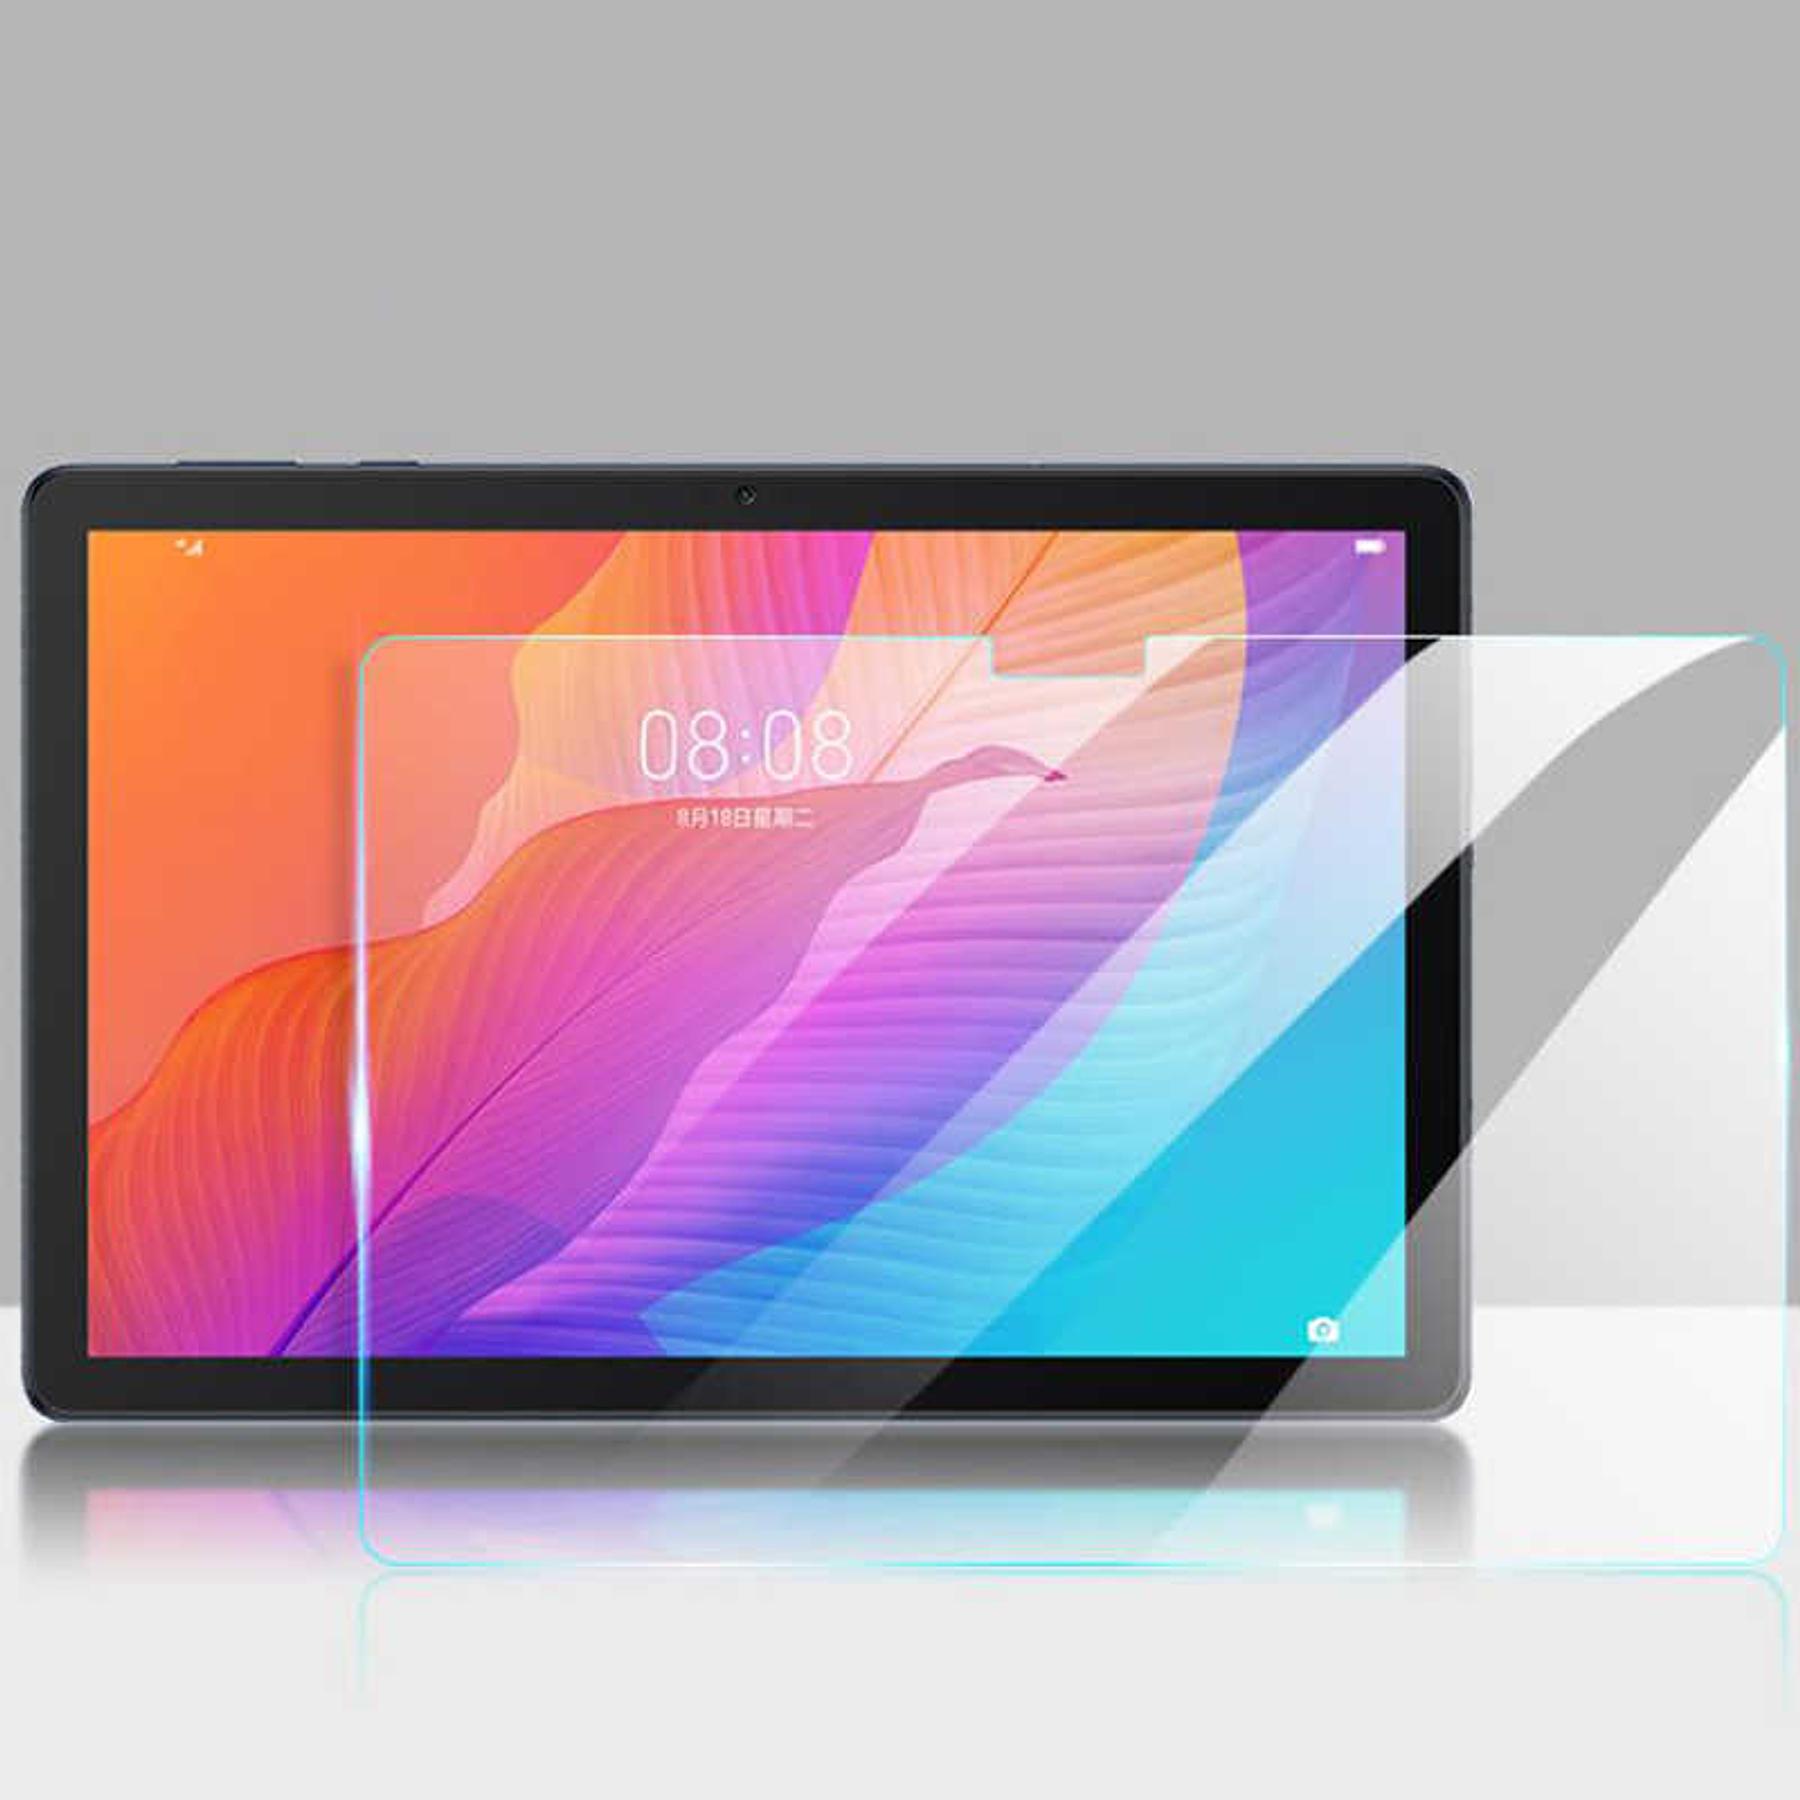 Huawei MatePad T10s (10.1